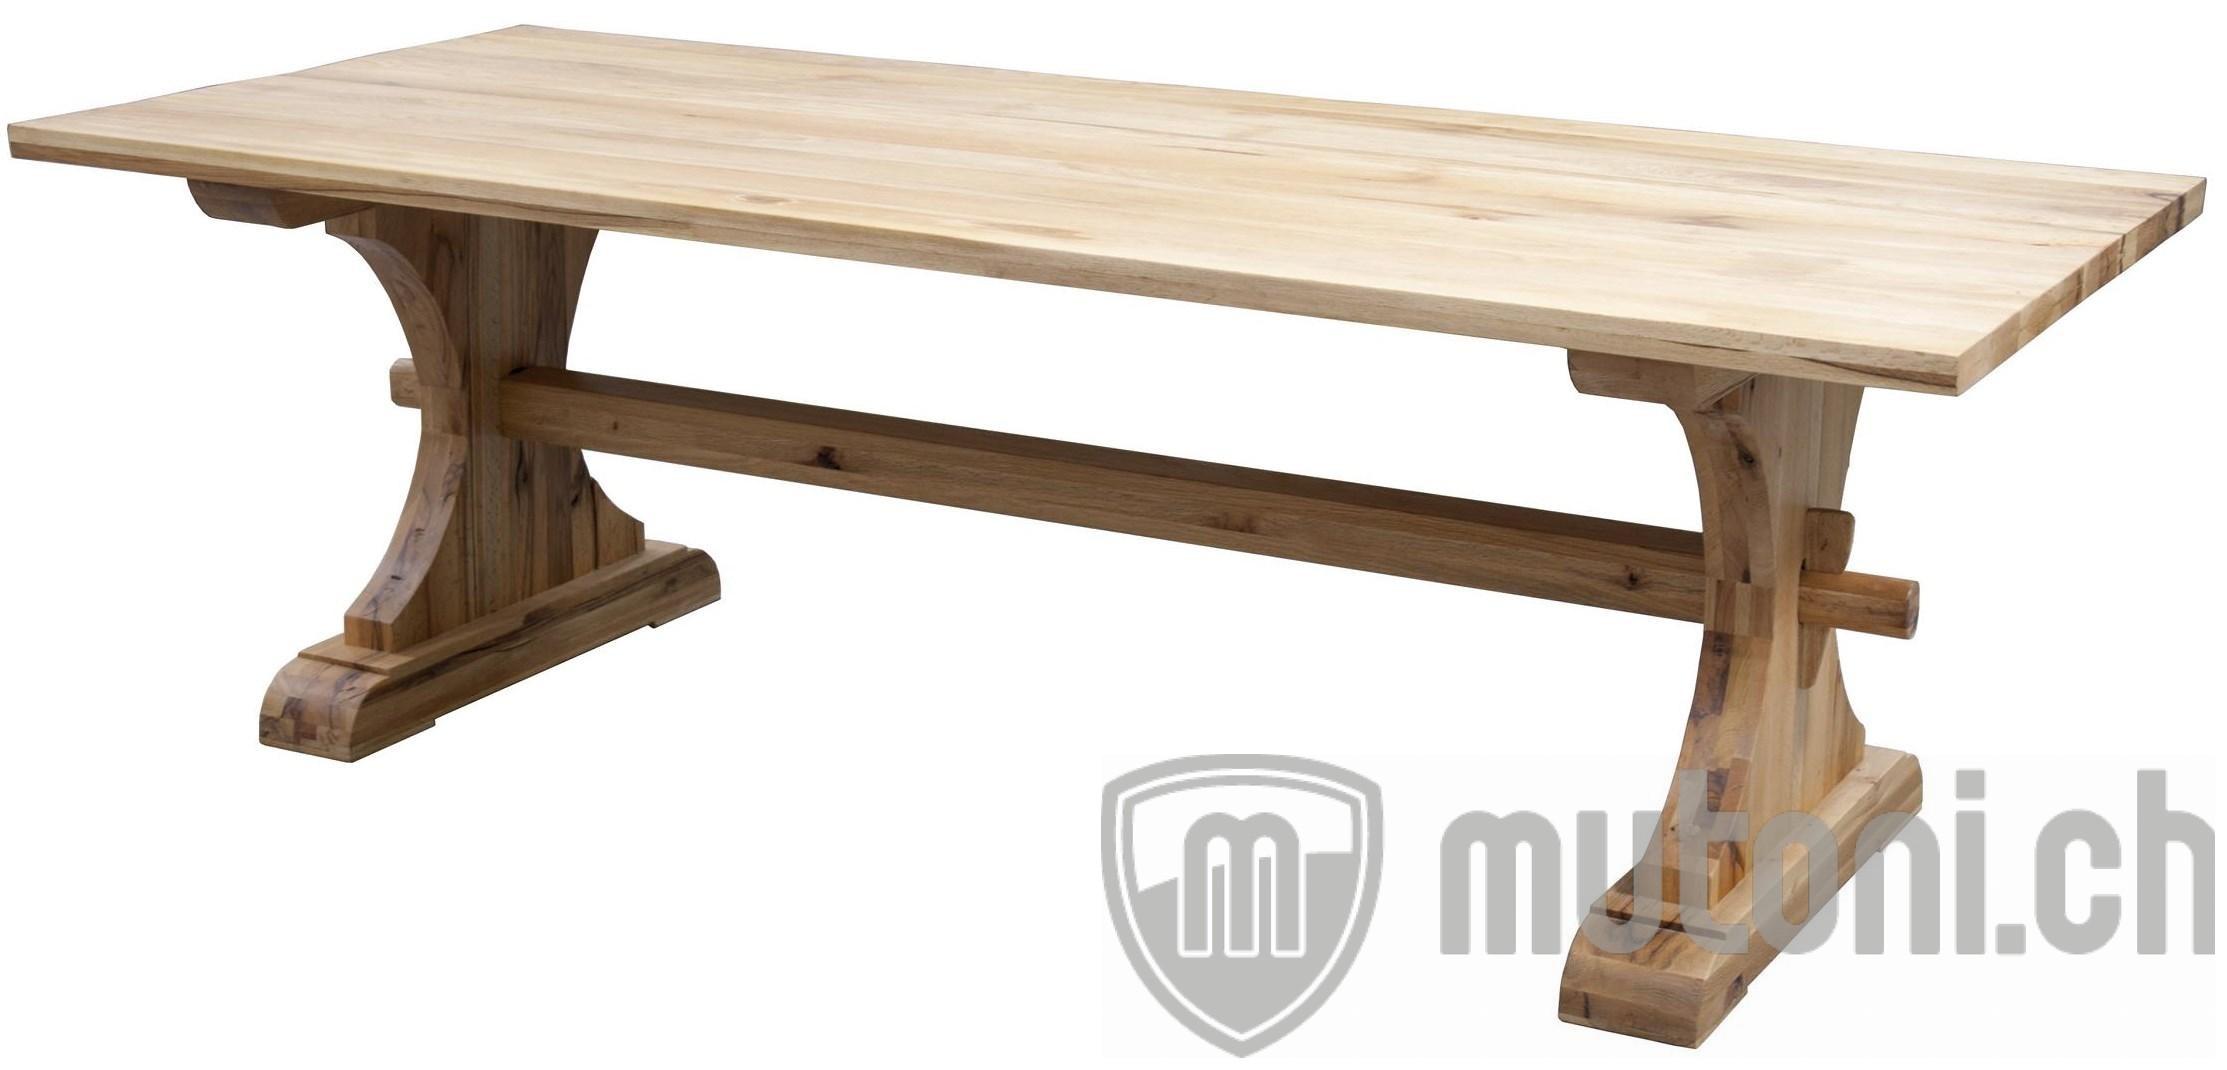 esstisch hamilton eiche rustikal mutoni wood mutoni. Black Bedroom Furniture Sets. Home Design Ideas